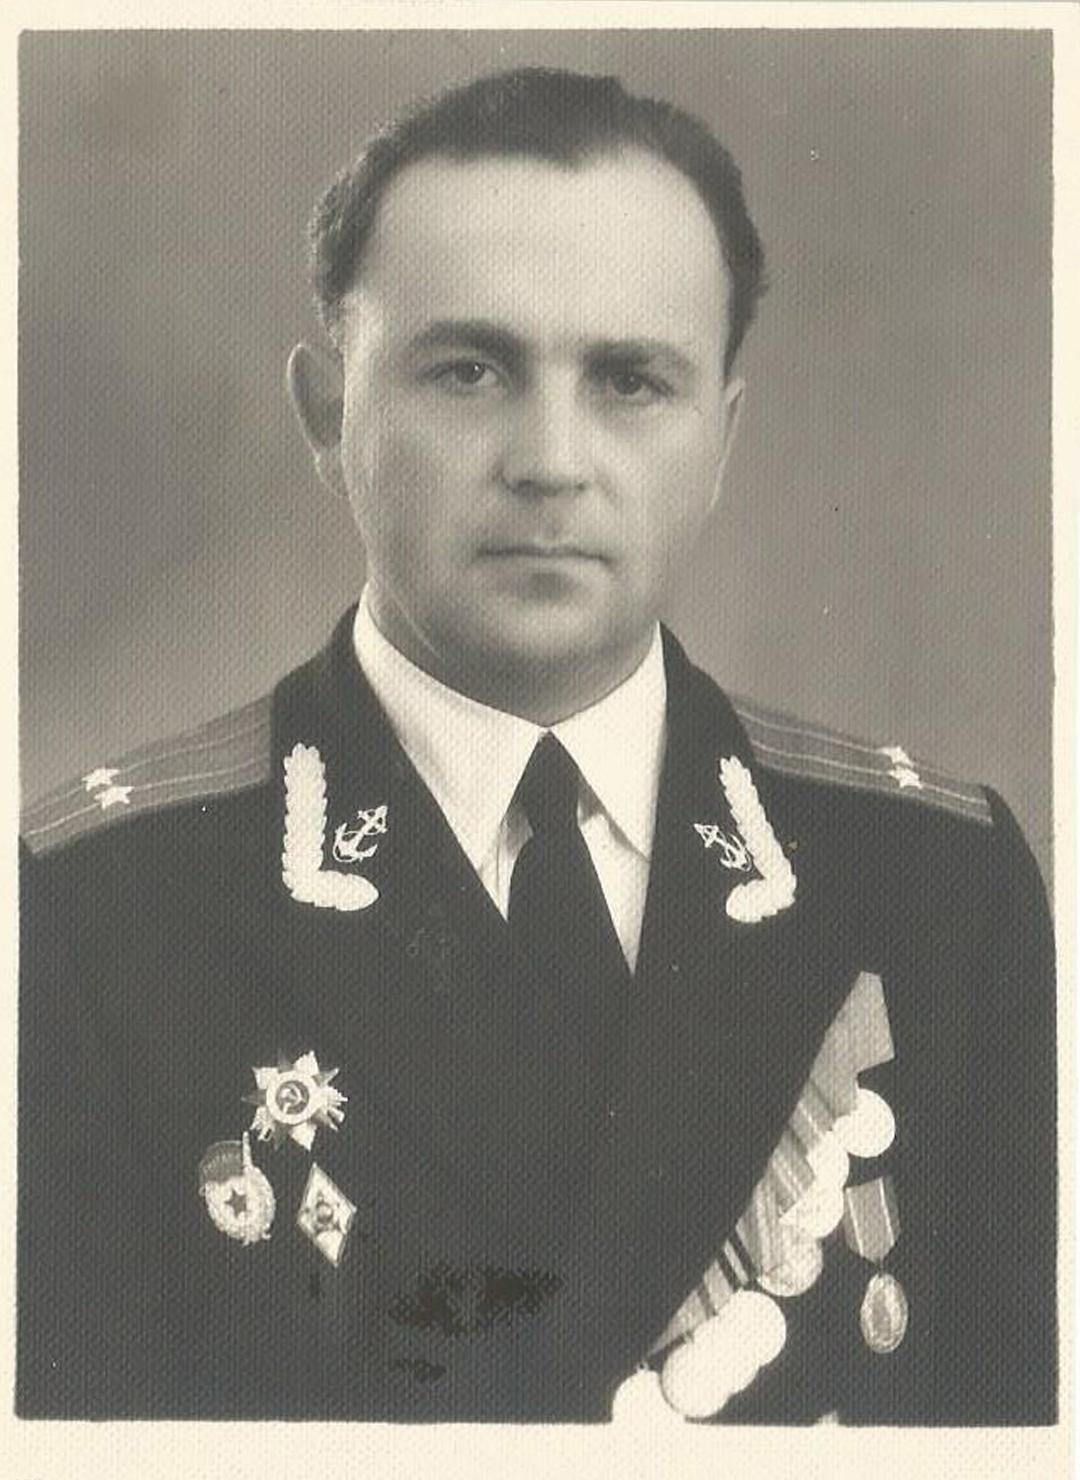 Козлов Валентин Петрович